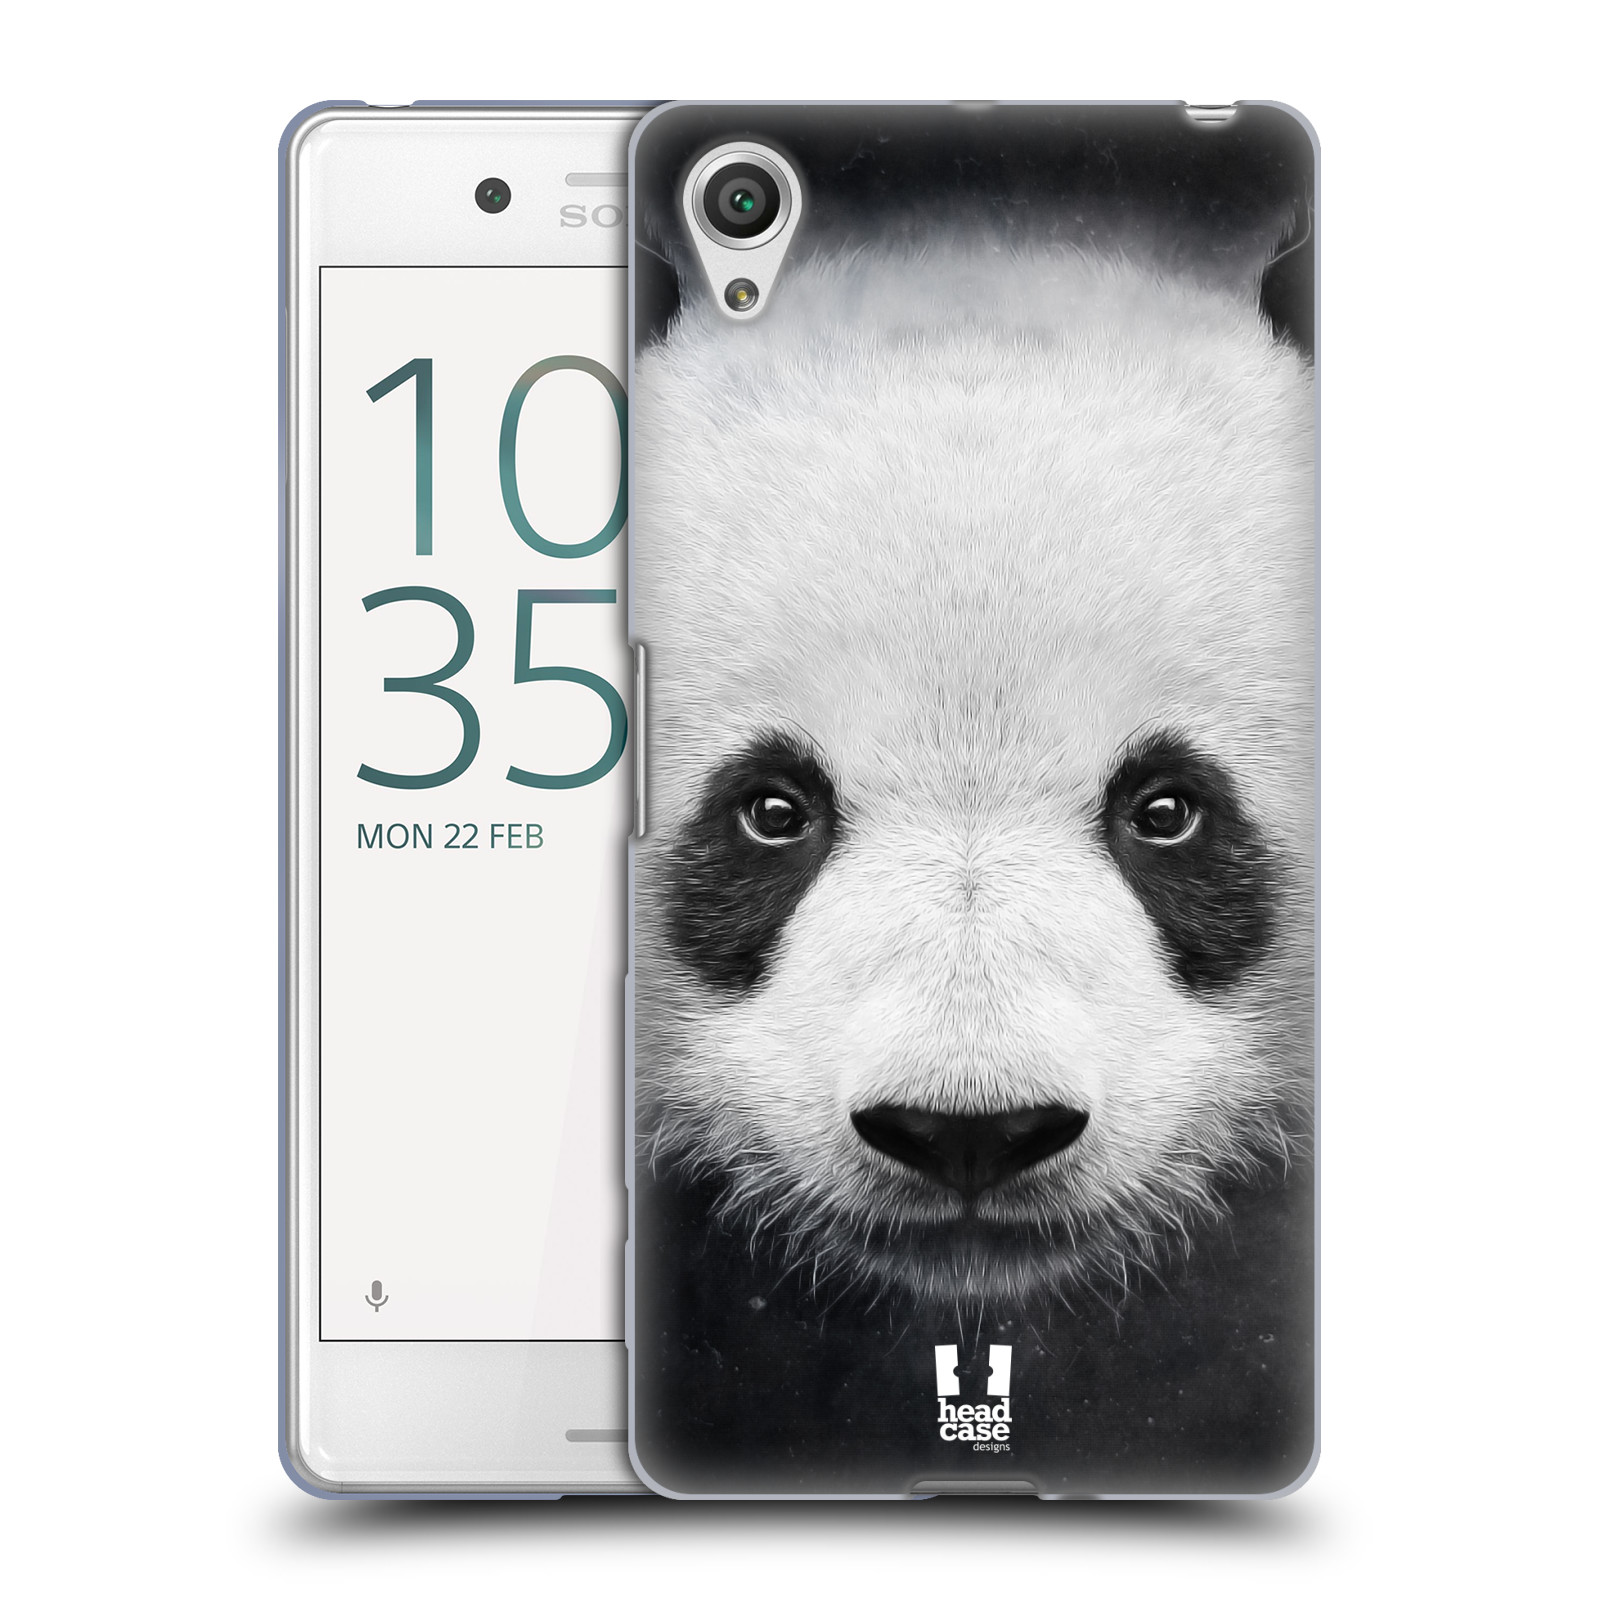 HEAD CASE silikonový obal na mobil Sony Xperia X PERFORMANCE (F8131, F8132) vzor Zvířecí tváře medvěd panda